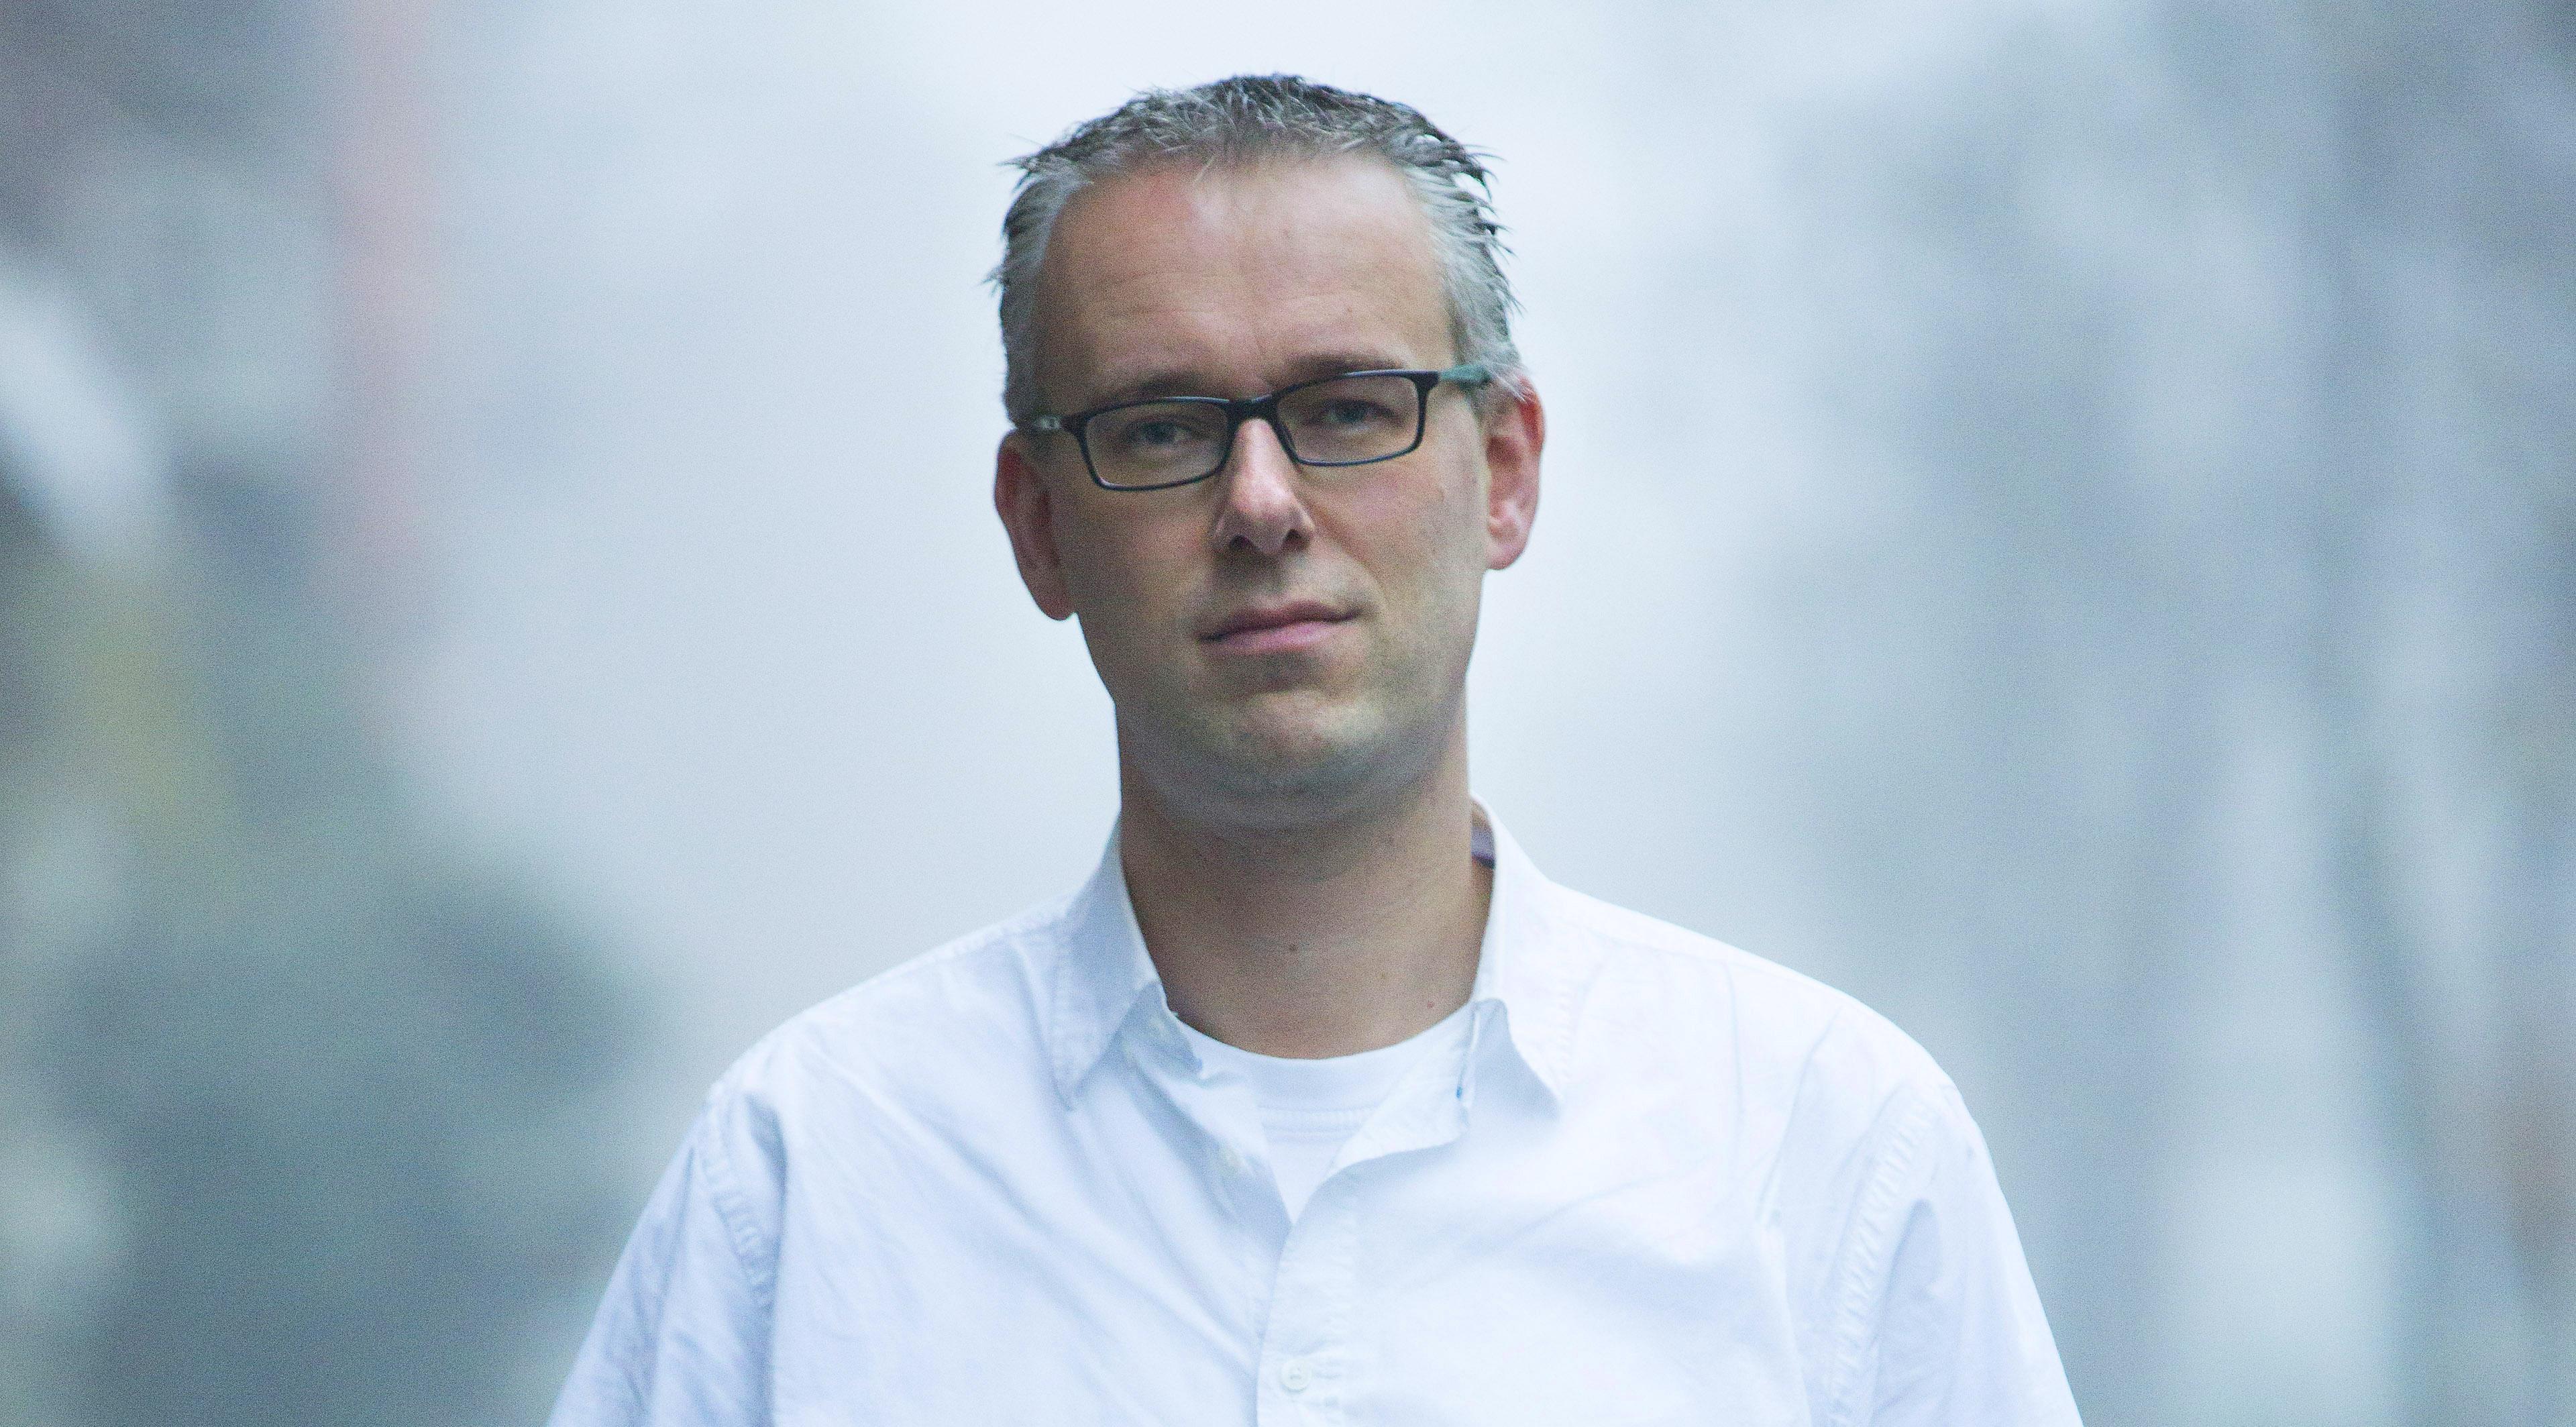 Prominente plek Kauthar Bouchallikht bij GroenLinks ongemakkelijk | column